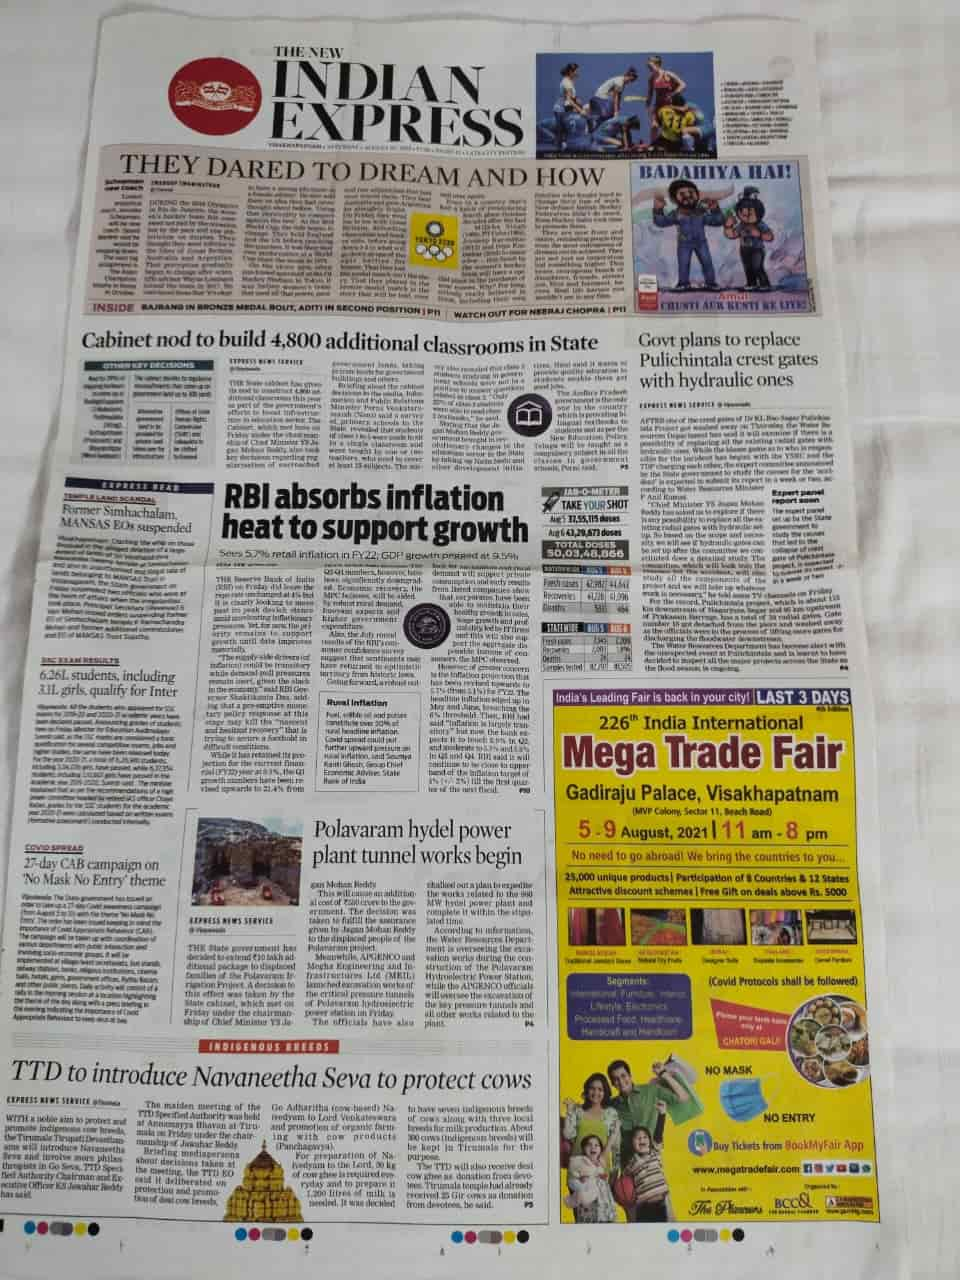 India International Mega Trade Fair Vizag 2021 Gadiraju Palace 5th August